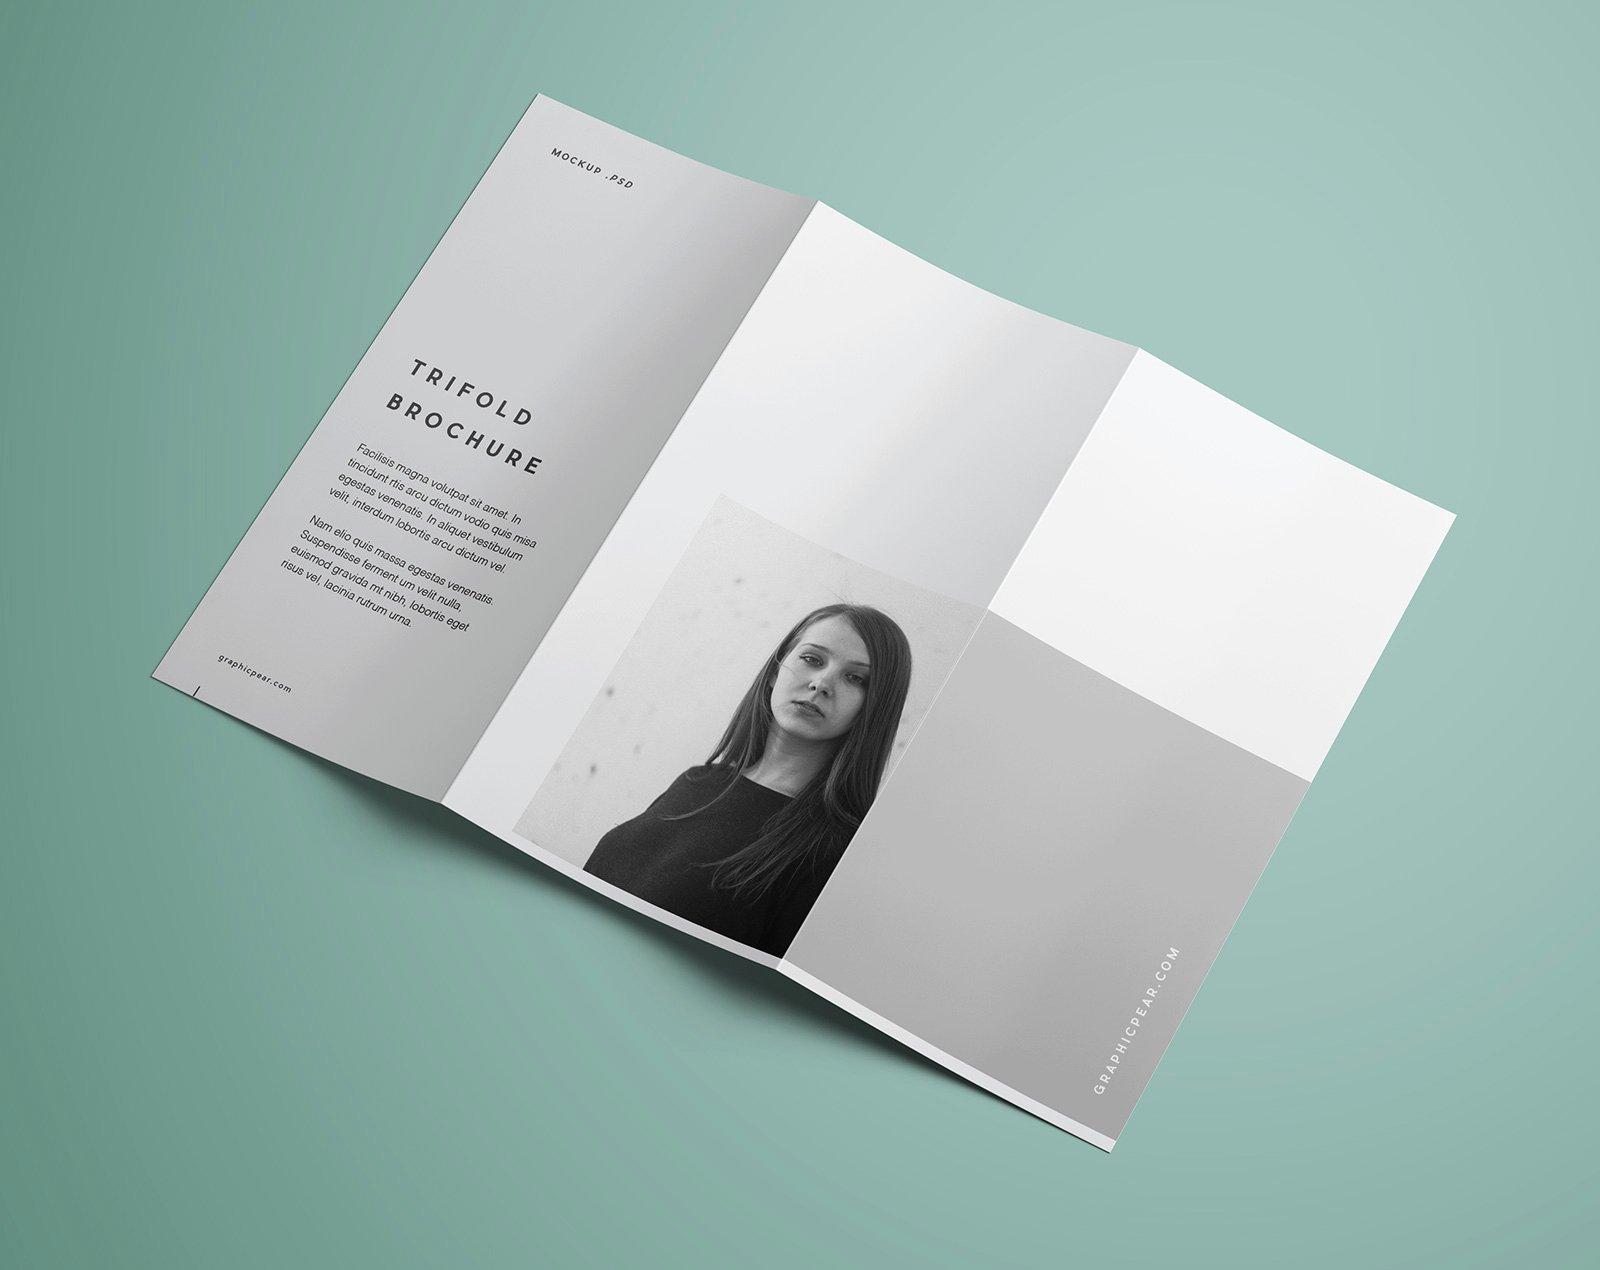 Tri Fold Brochure Template Psd Elegant Free Premium Tri Fold Brochure Mockup Psd Good Mockups